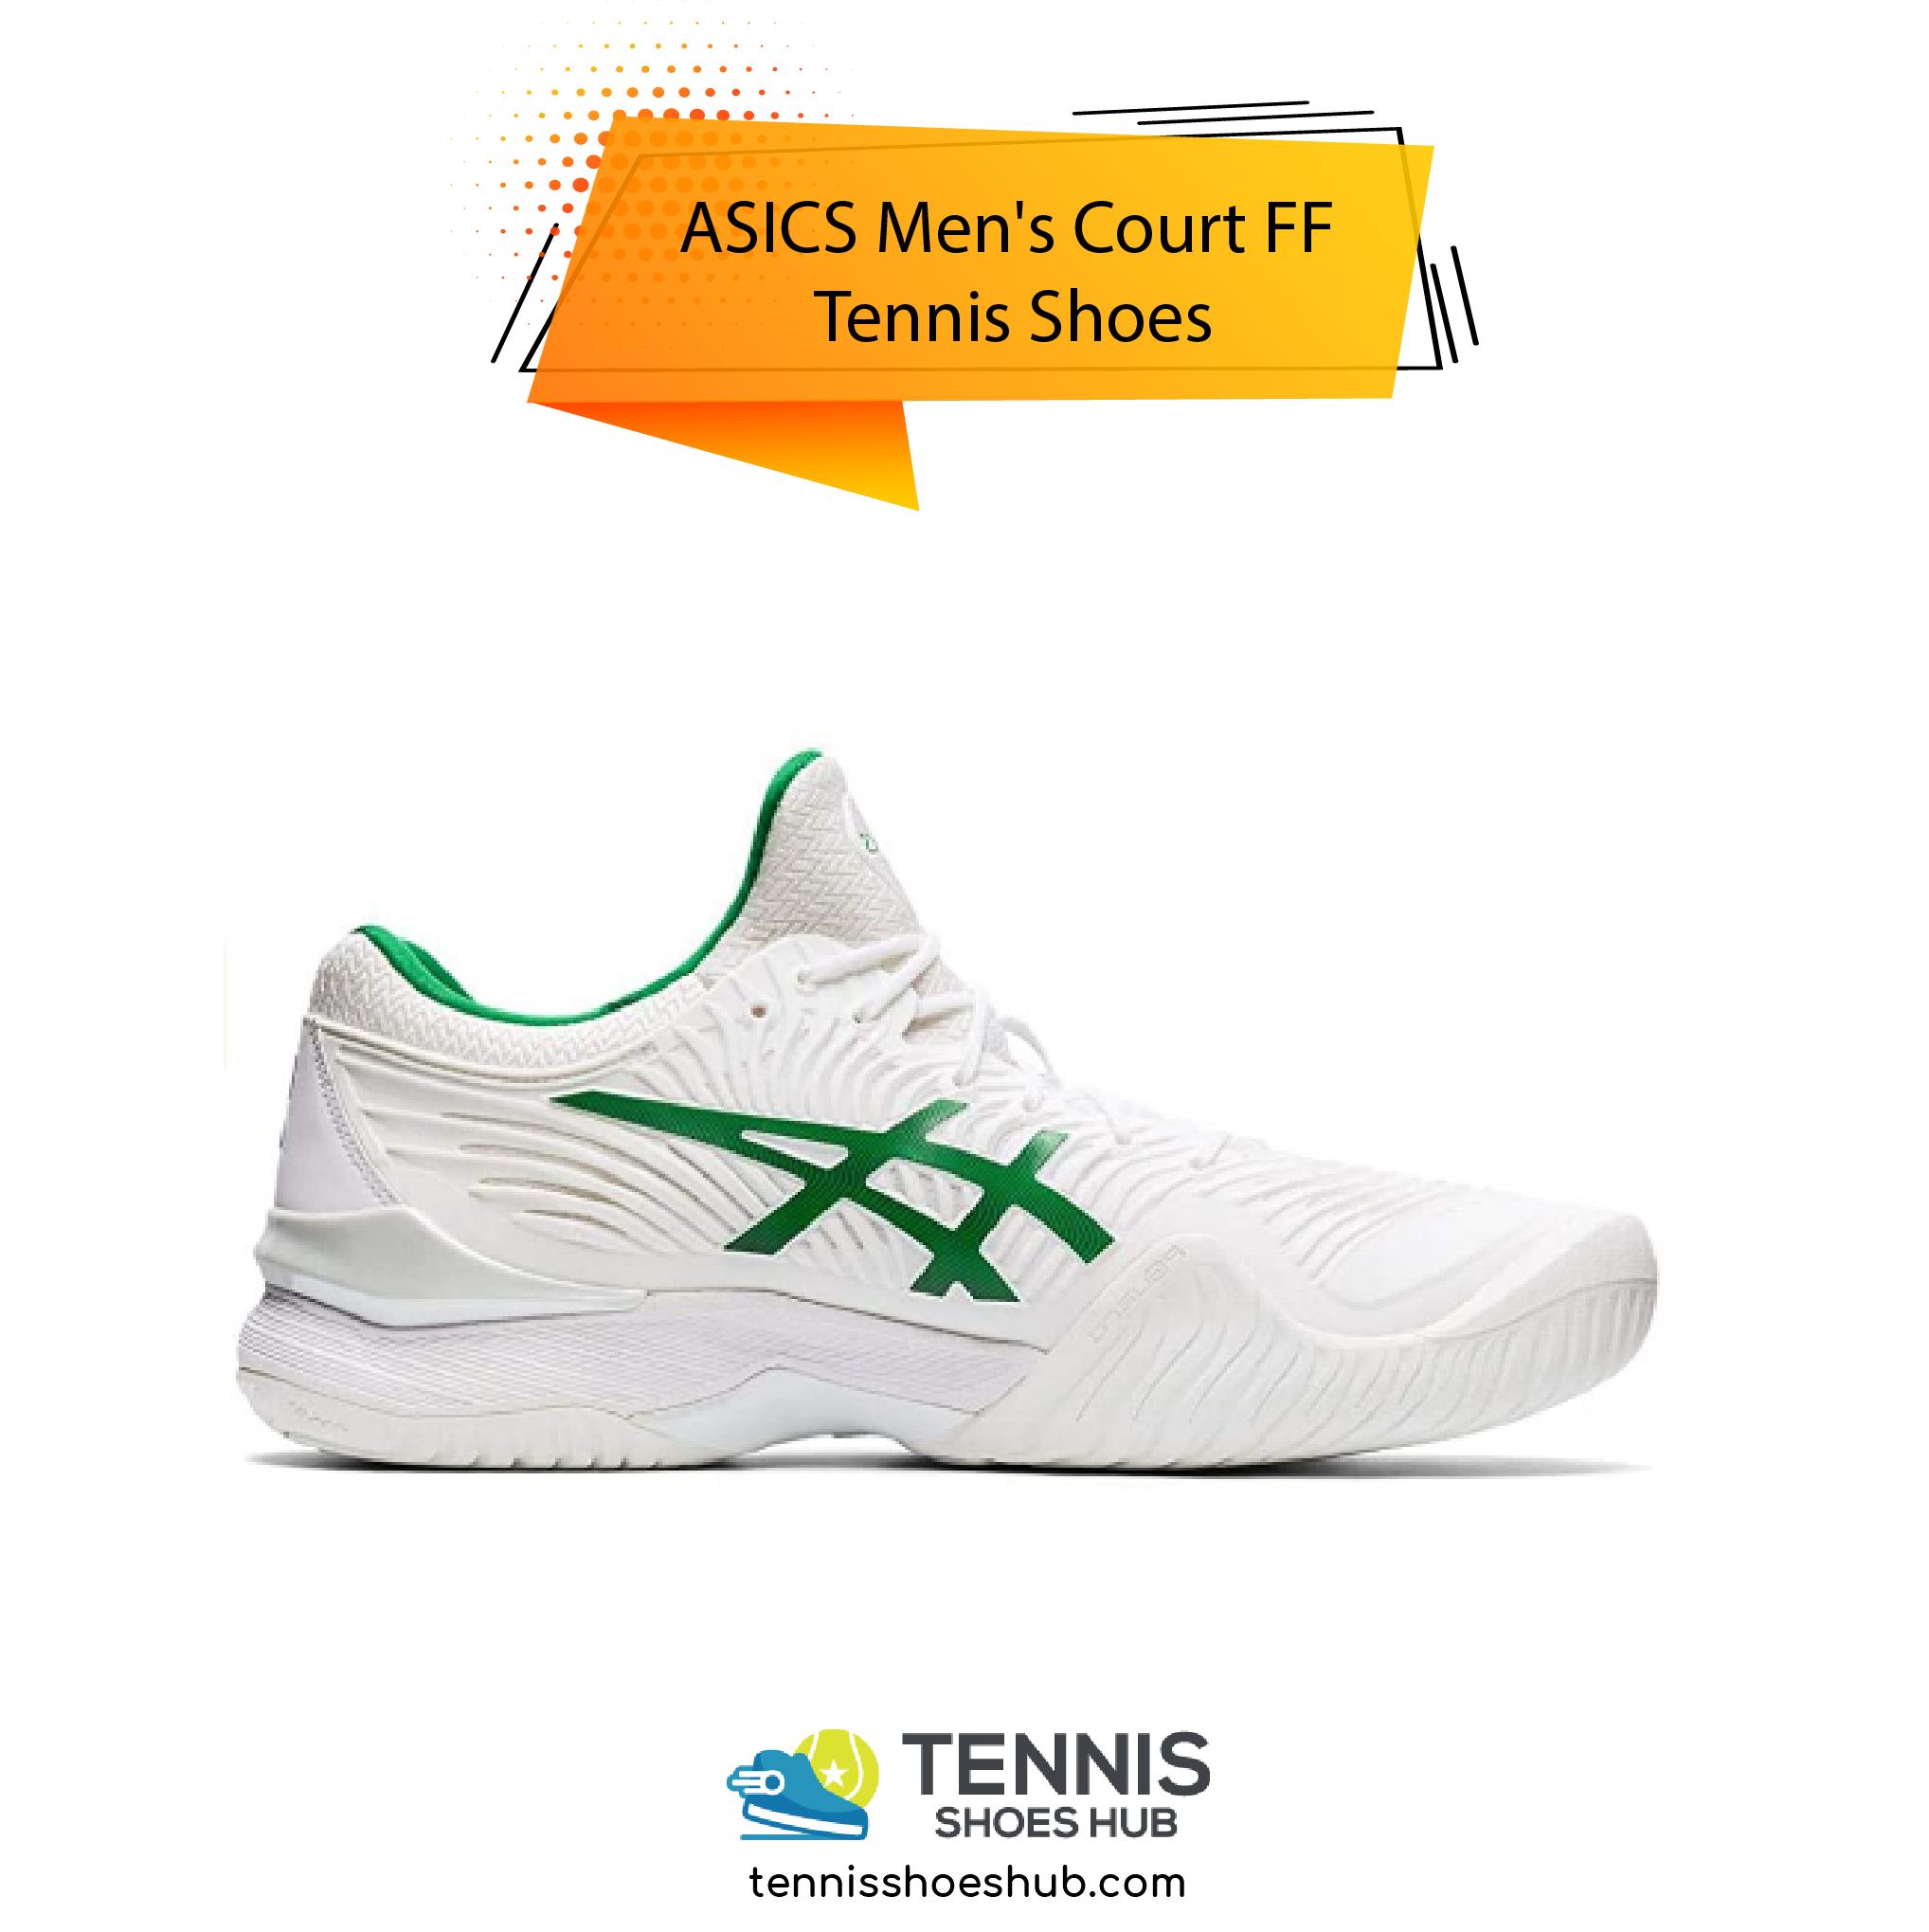 ASICS Mens Court FF Tennis Shoes 01